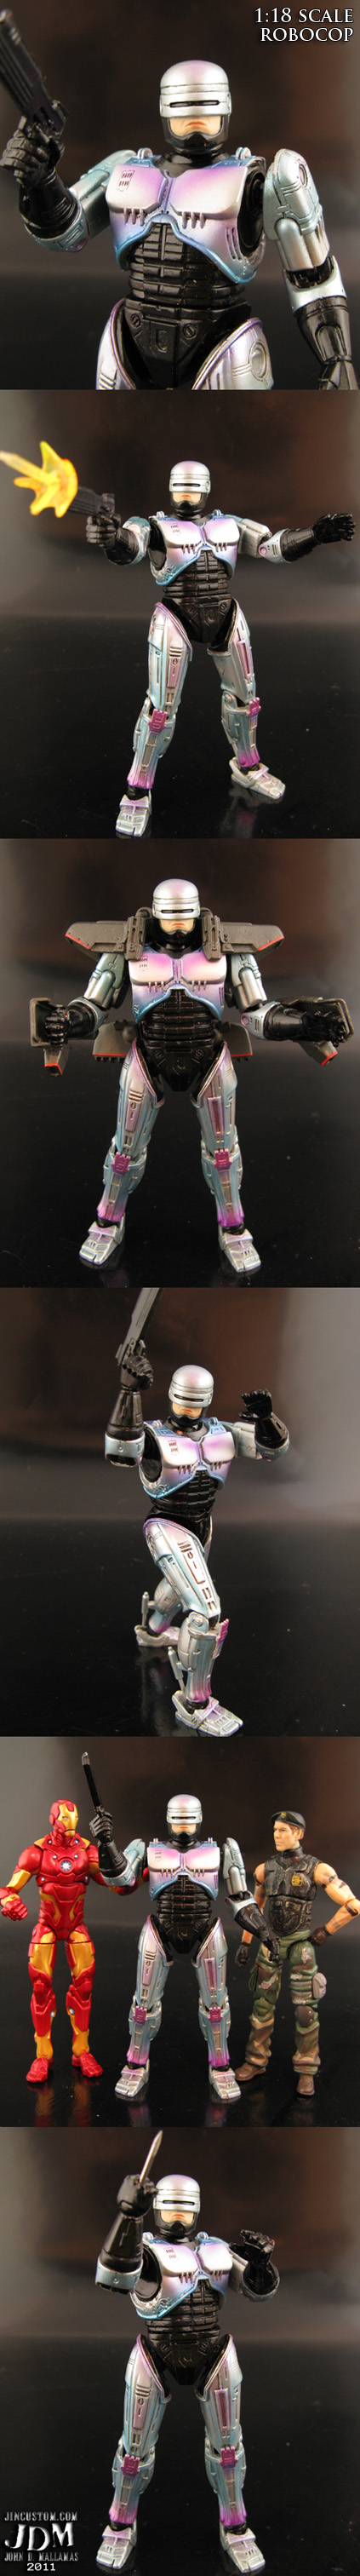 Custom 1:18 Robocop